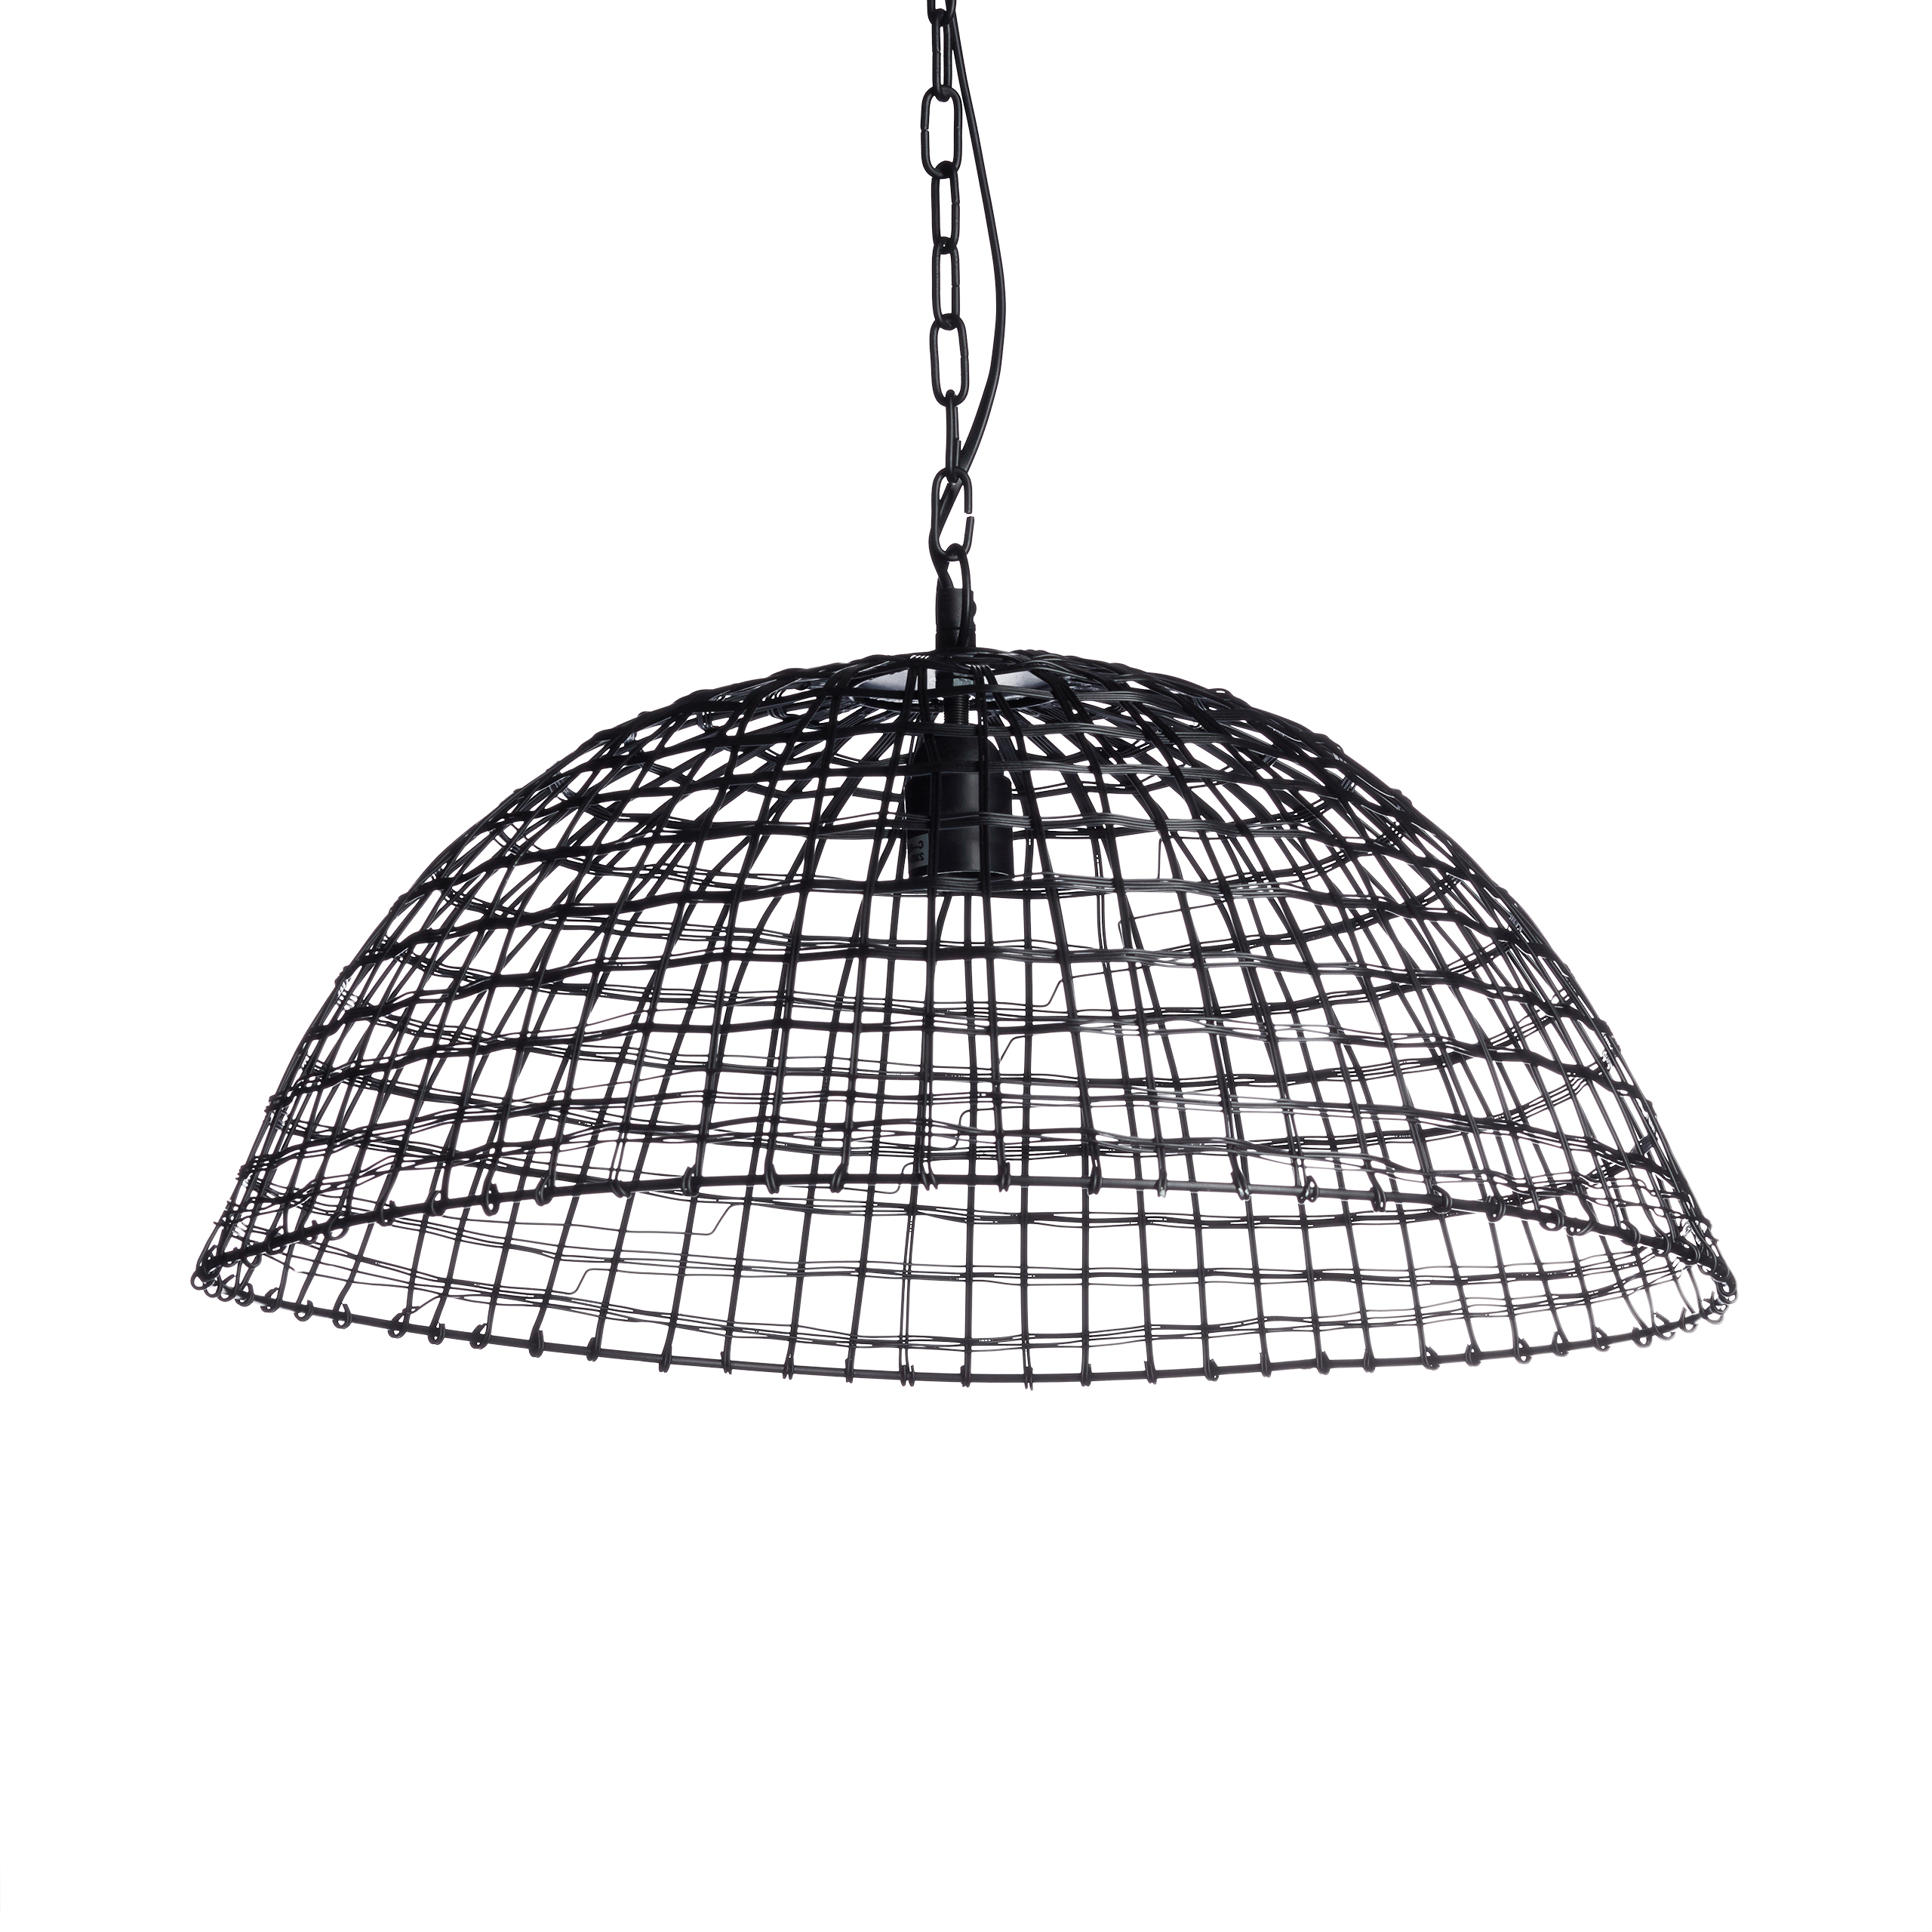 Lampara-colgante-techo-diseno-industrial-iluminacion-hogar-hierro-forjado-negro